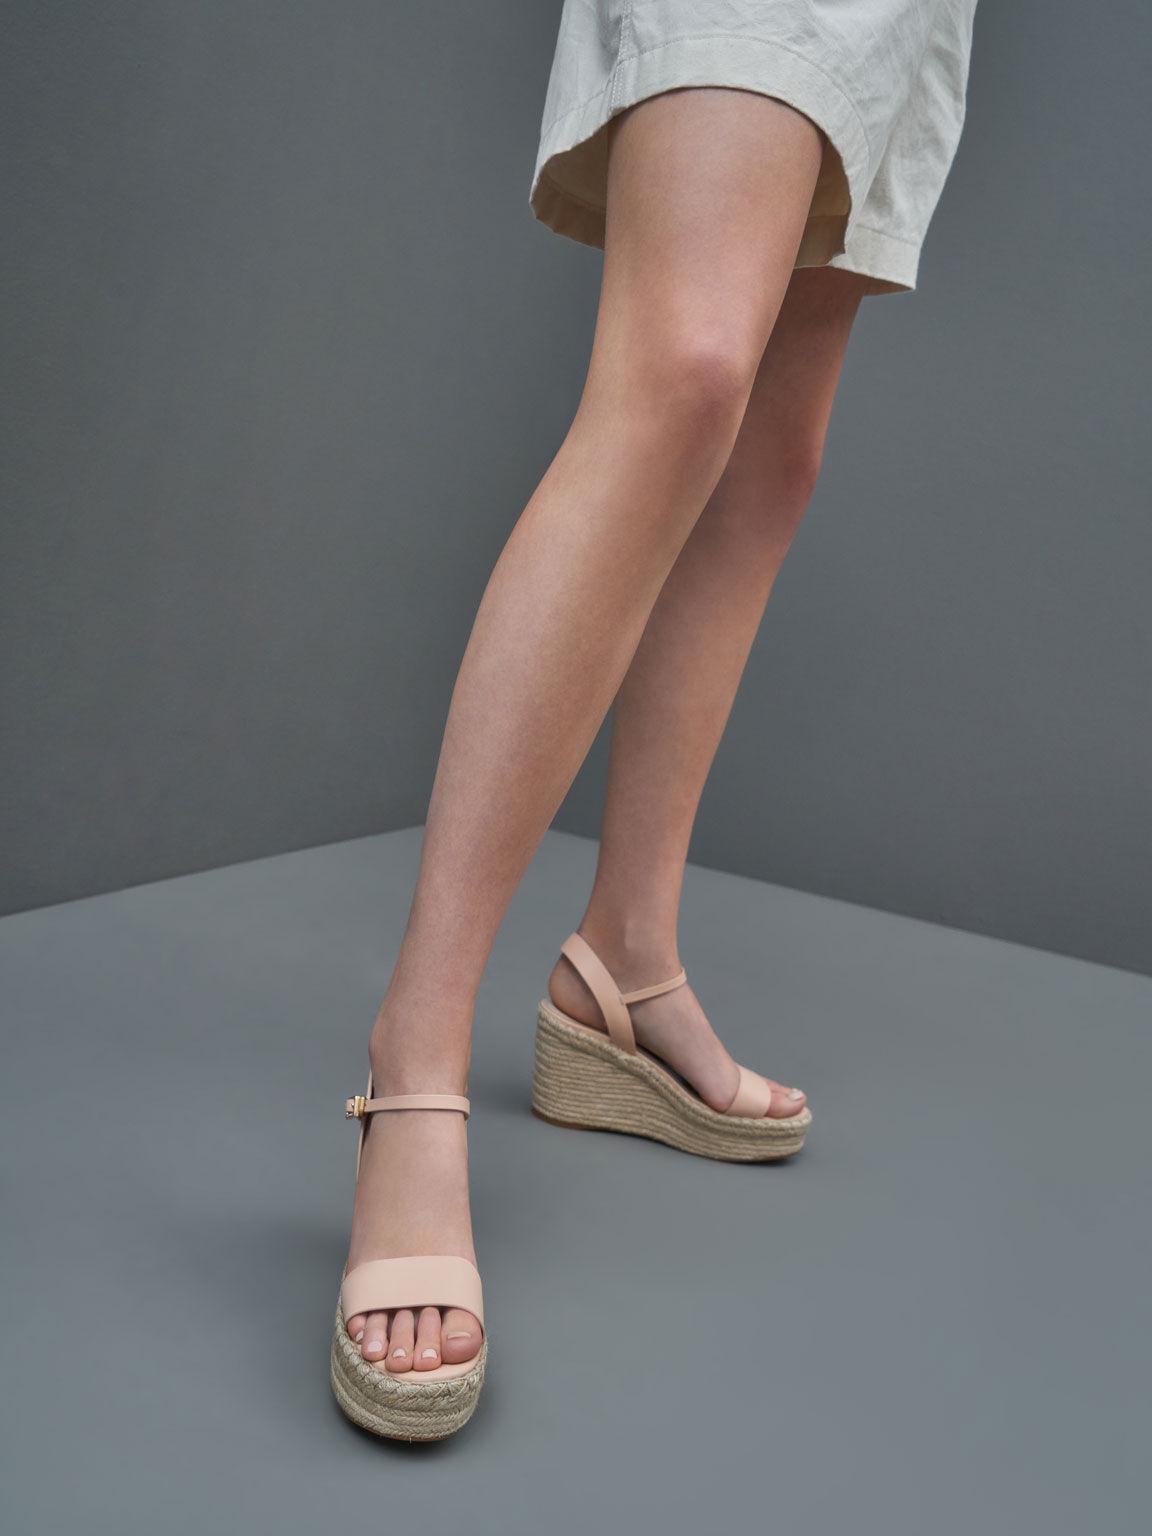 Ankle Strap Espadrille Wedges, Nude, hi-res